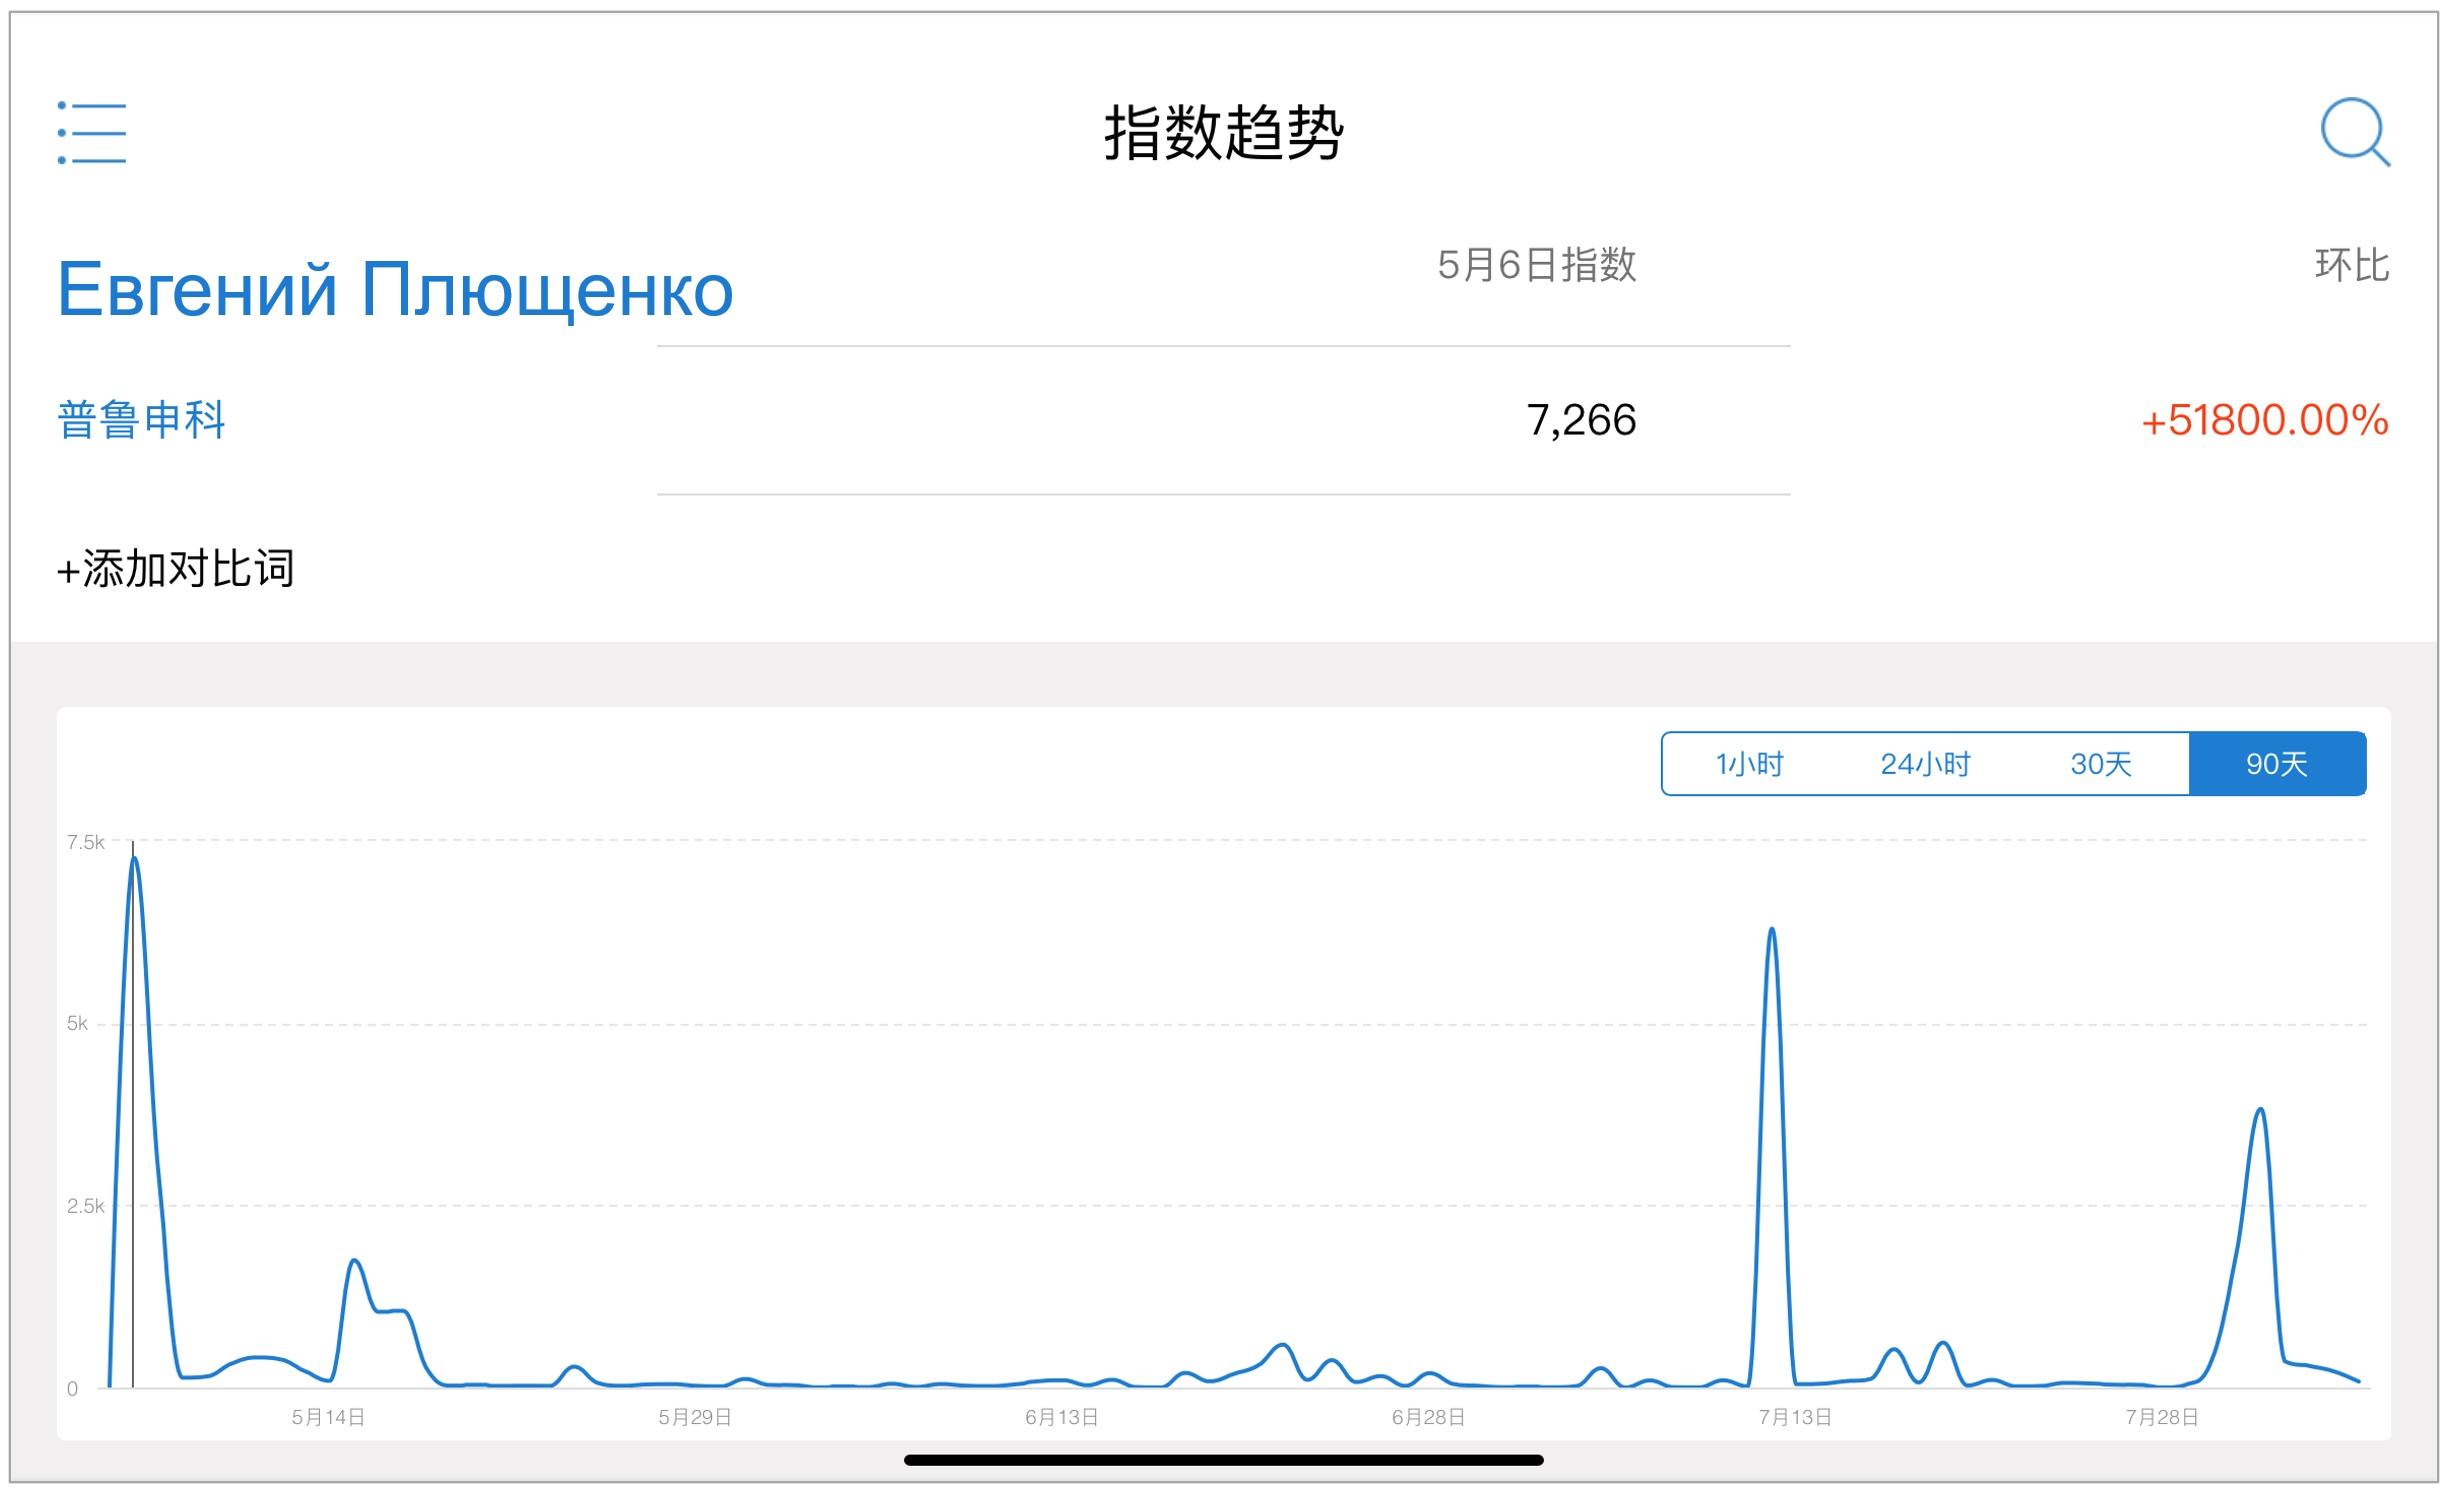 Король и Королева китайского интернета: статистика по Weibo